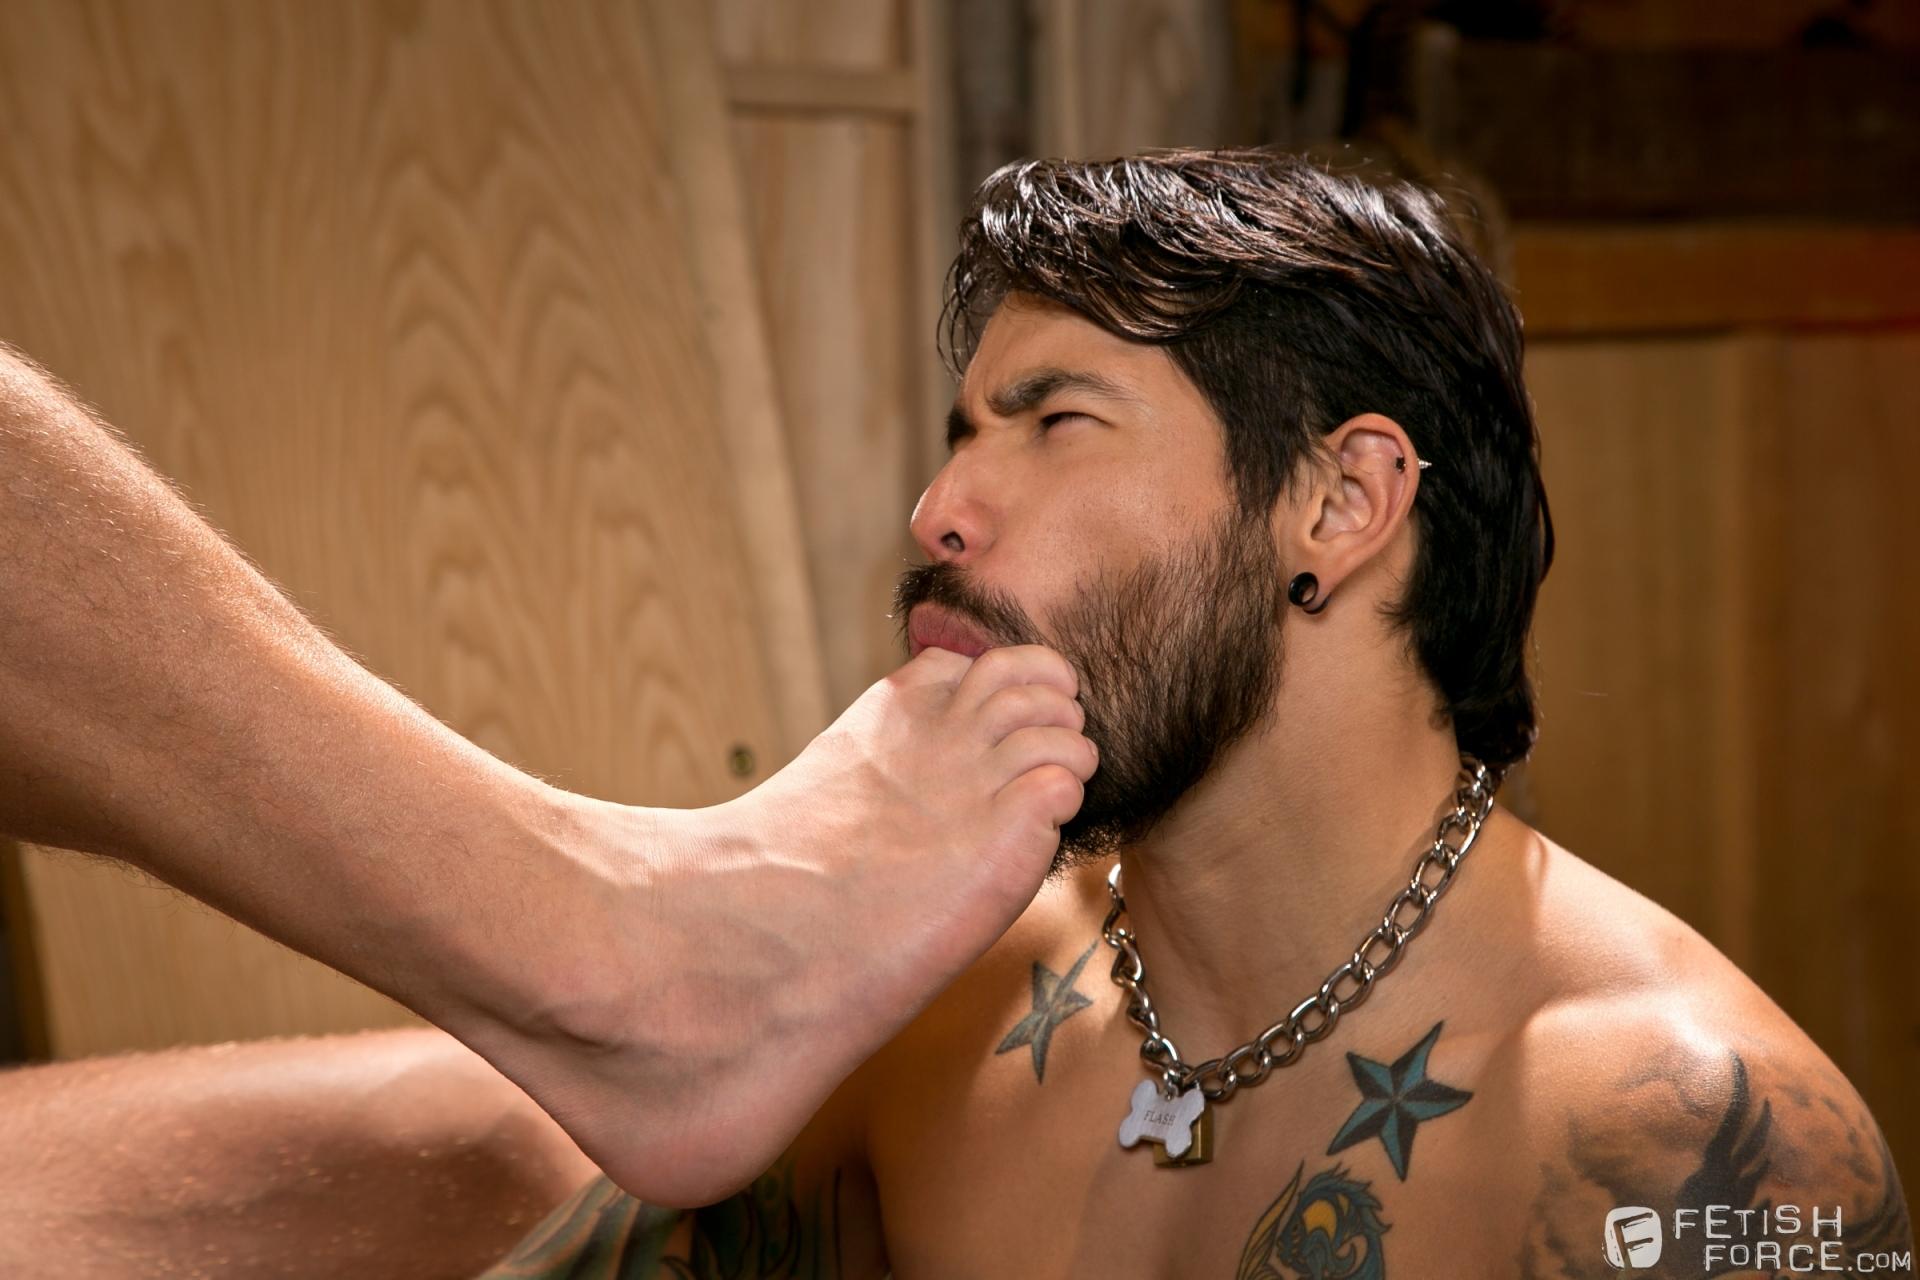 Ethnic gay male feet worship mp4